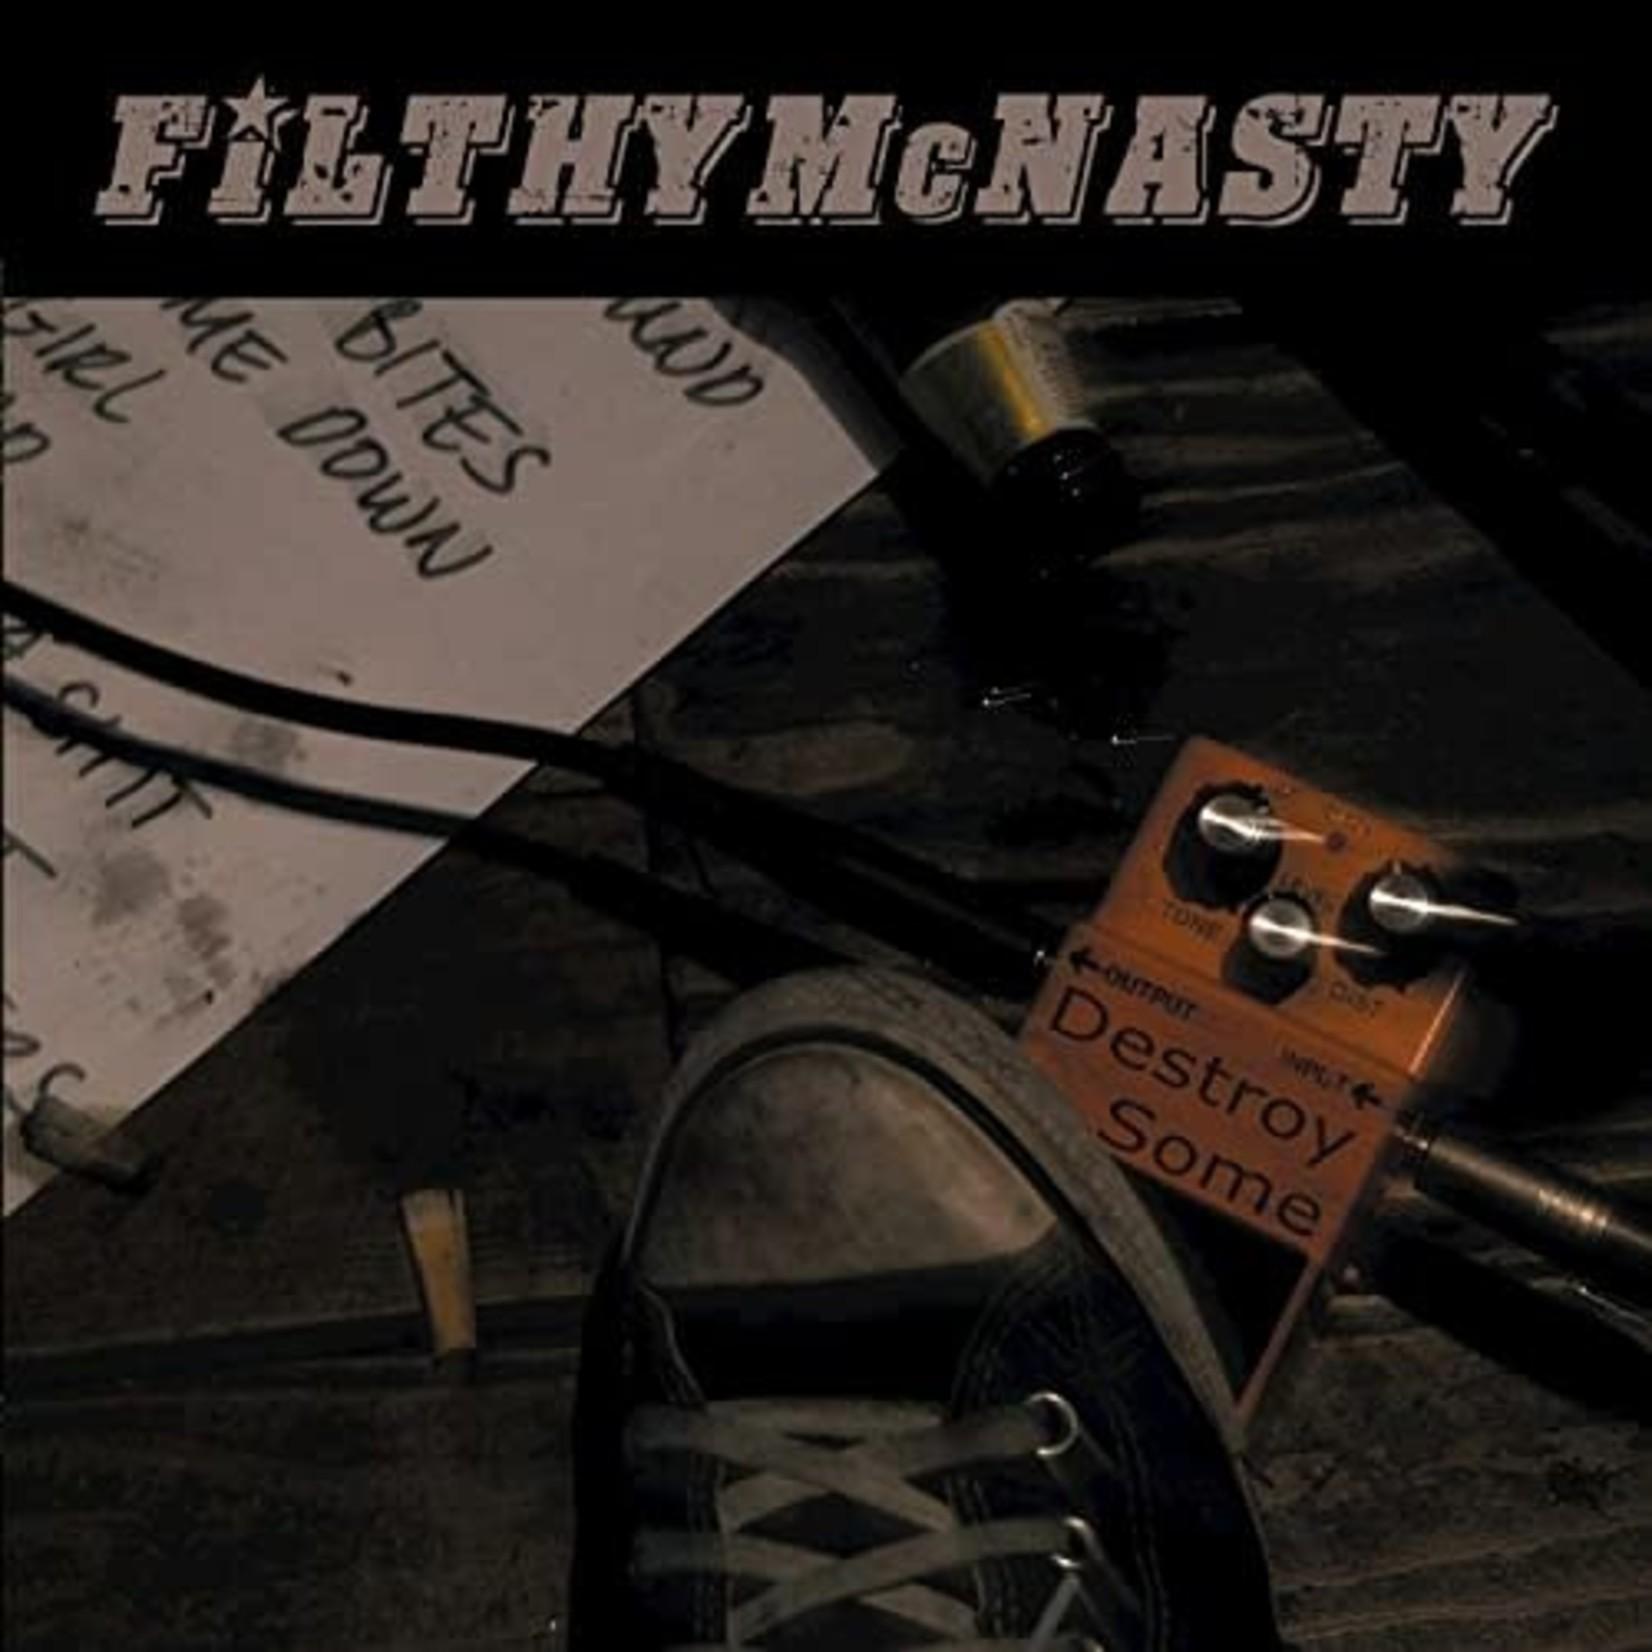 FILTHY MCNASTY - Destroy some   (VINYL)